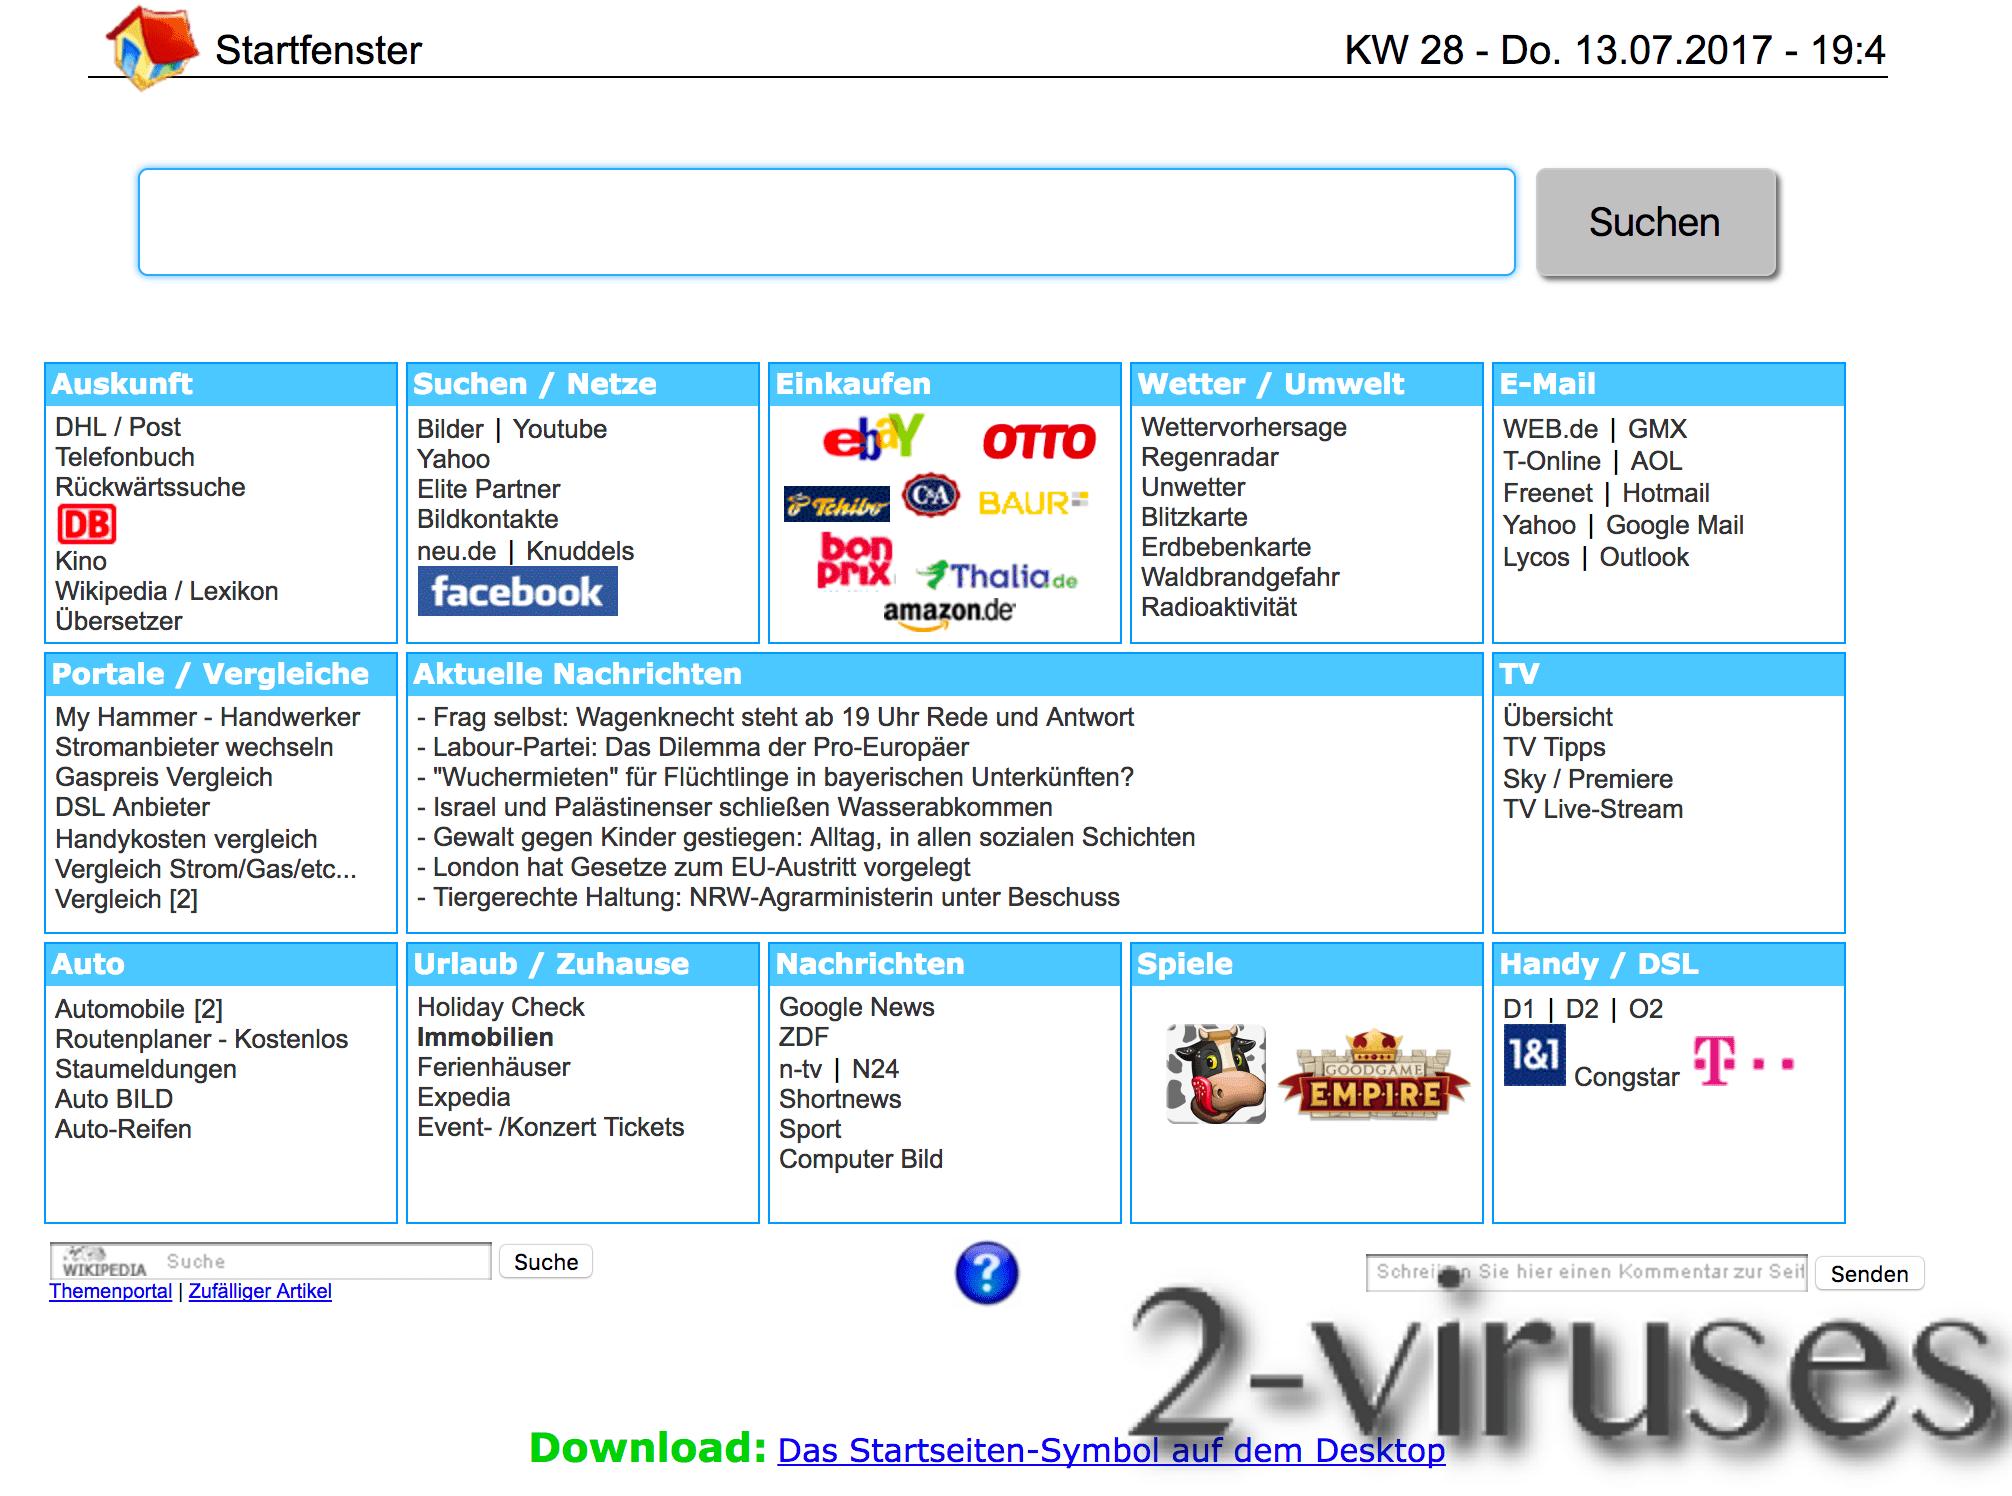 startfenster.de browser hijacker virus